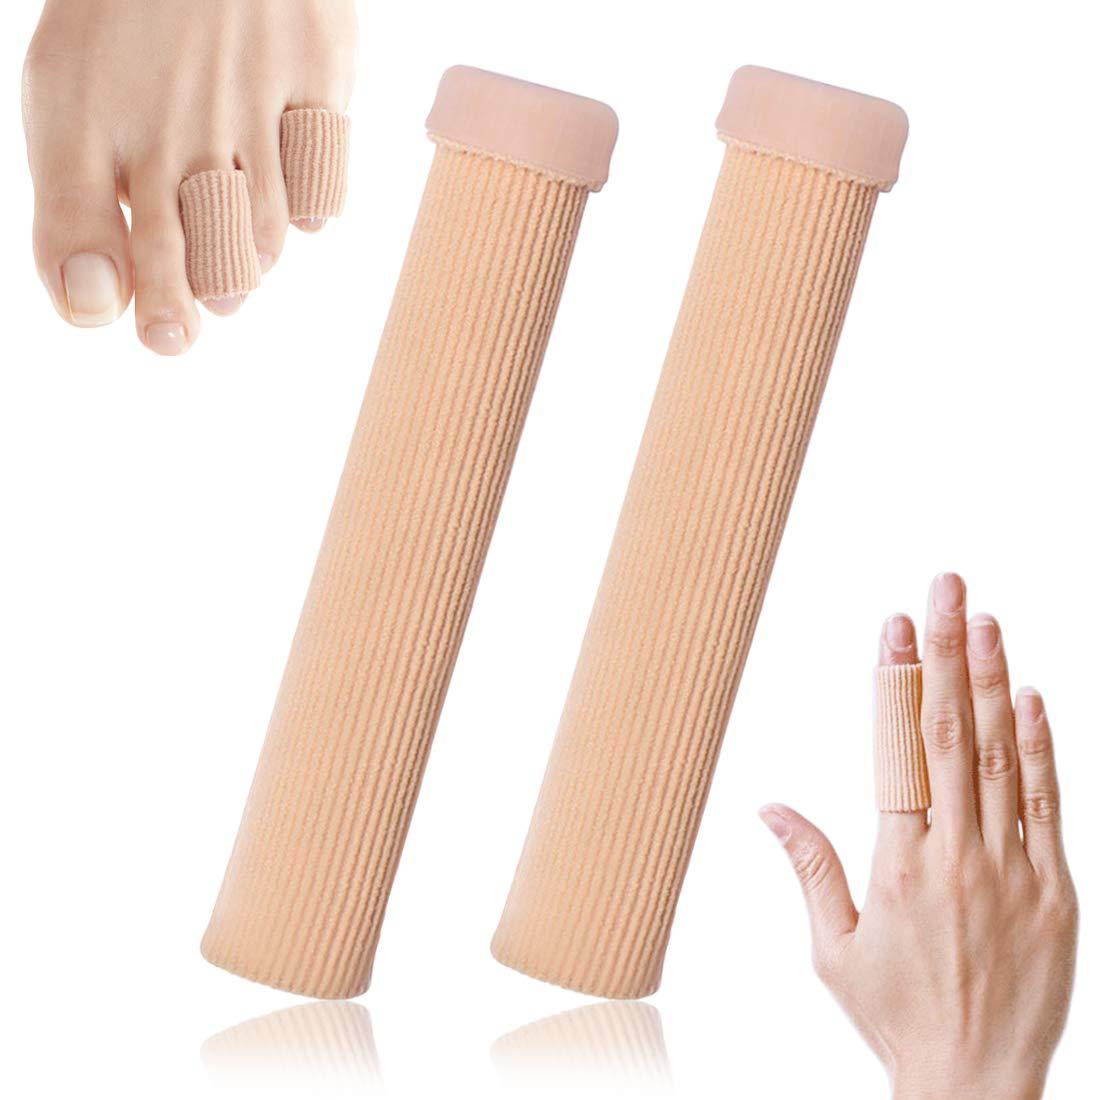 "Kalevel 2pcs Large Toe Tubes Finger Protectors Gel Corn Pad Cushions Fabric Toe Finger Sleeve Separators 5.9"" for Bunion, Hammer Toe, Callus, Corn, Blister Pain Pressure Relief (L)"